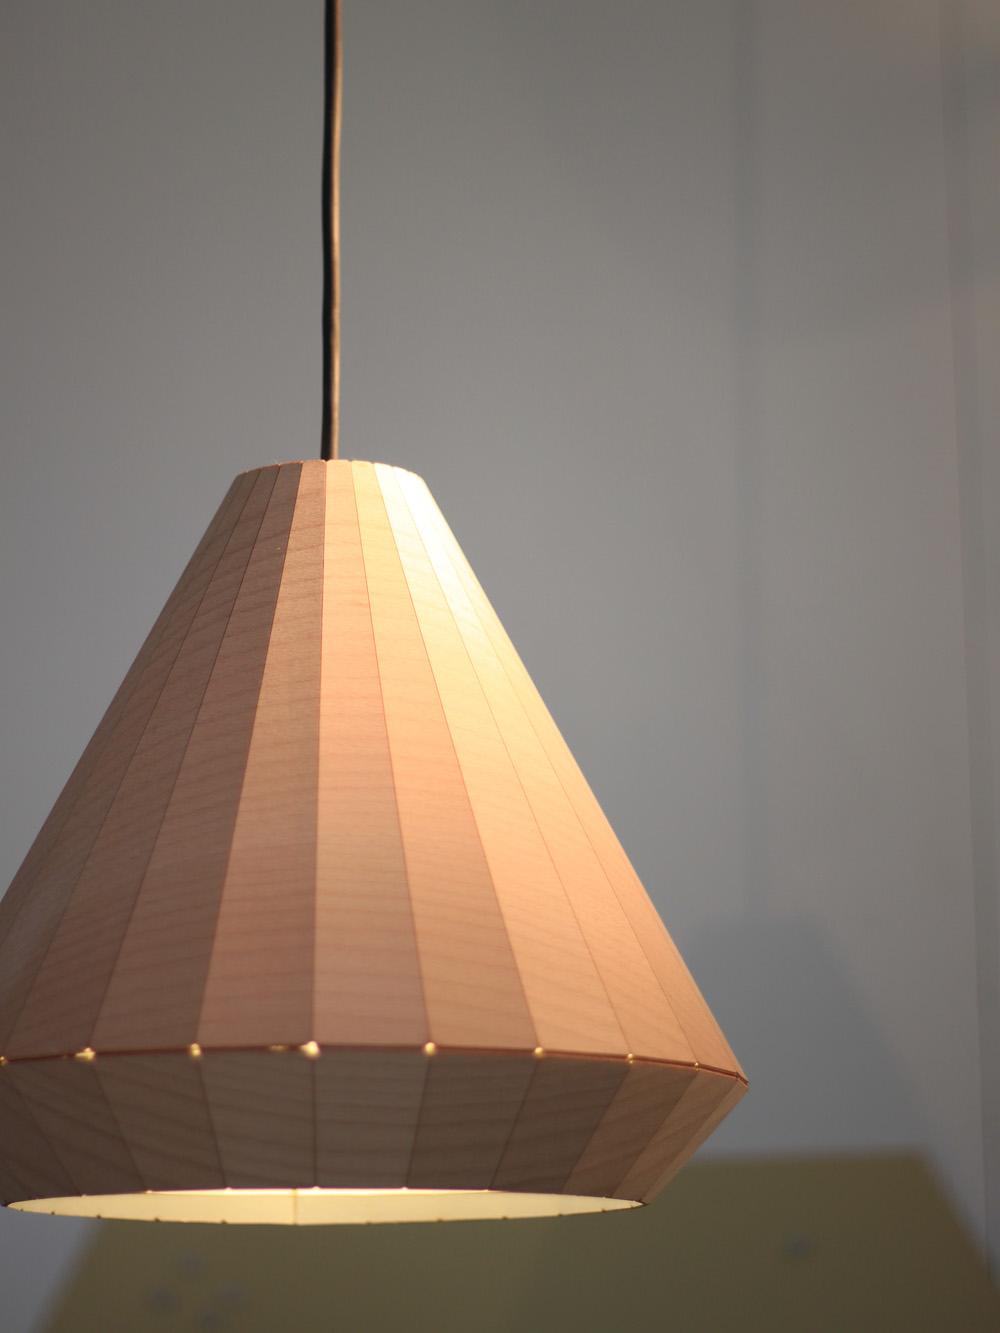 Vij5-Wooden-Light-setting-01-2014-image-by-Vij5 RS.jpg